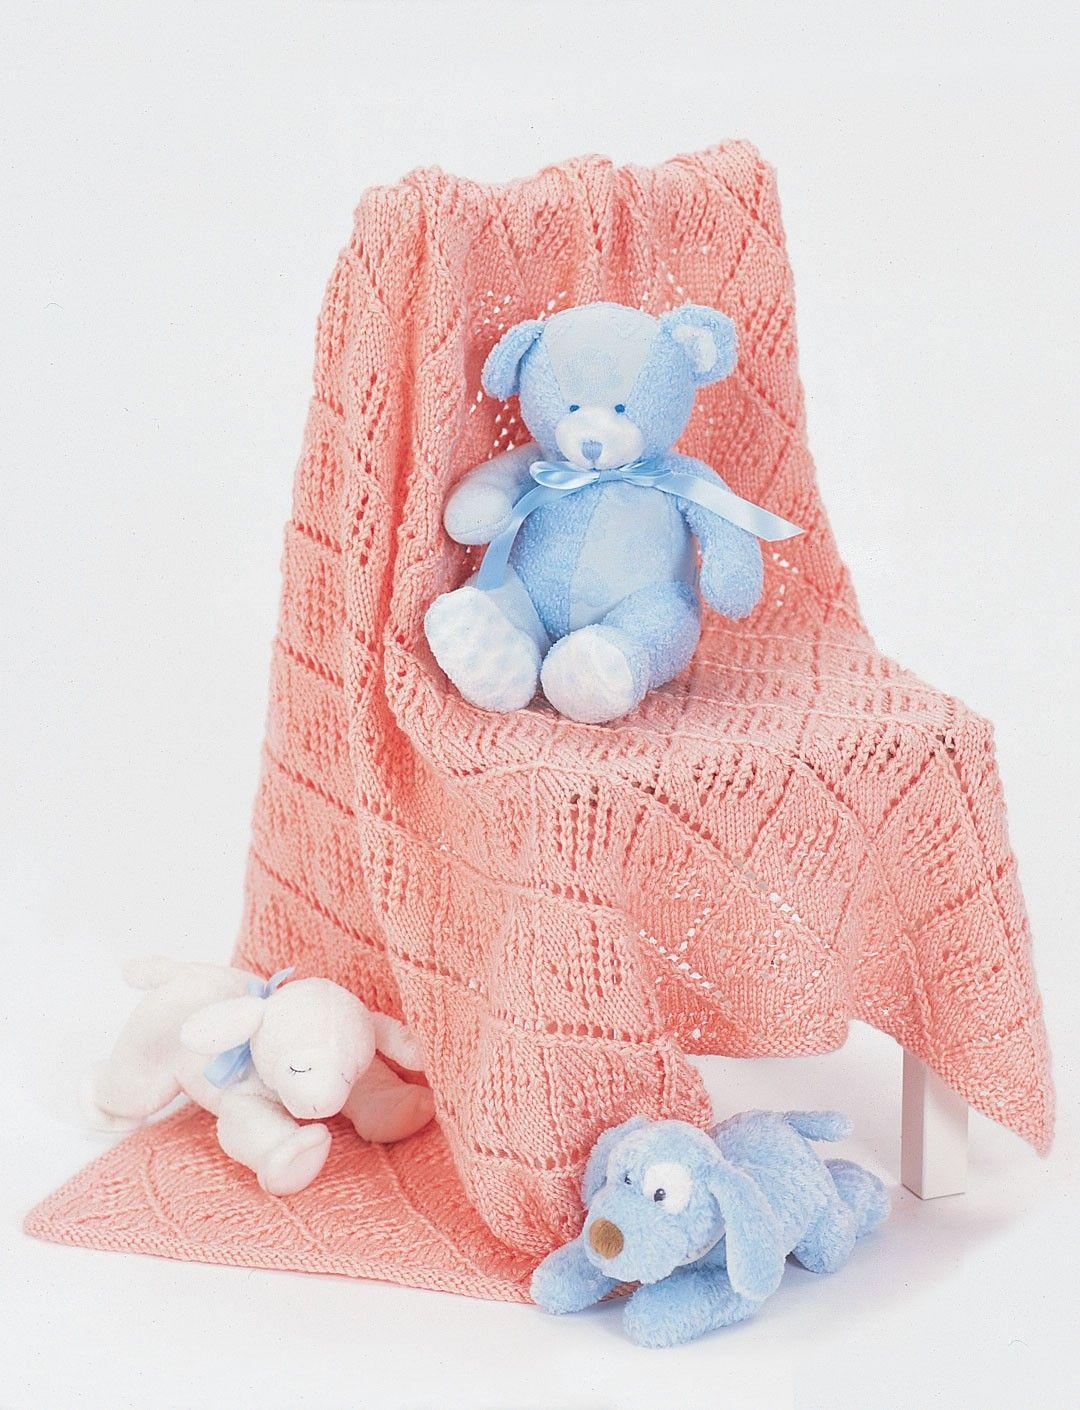 Yarnspirations.com - Bernat Baby Blanket - Patterns    Yarnspirations